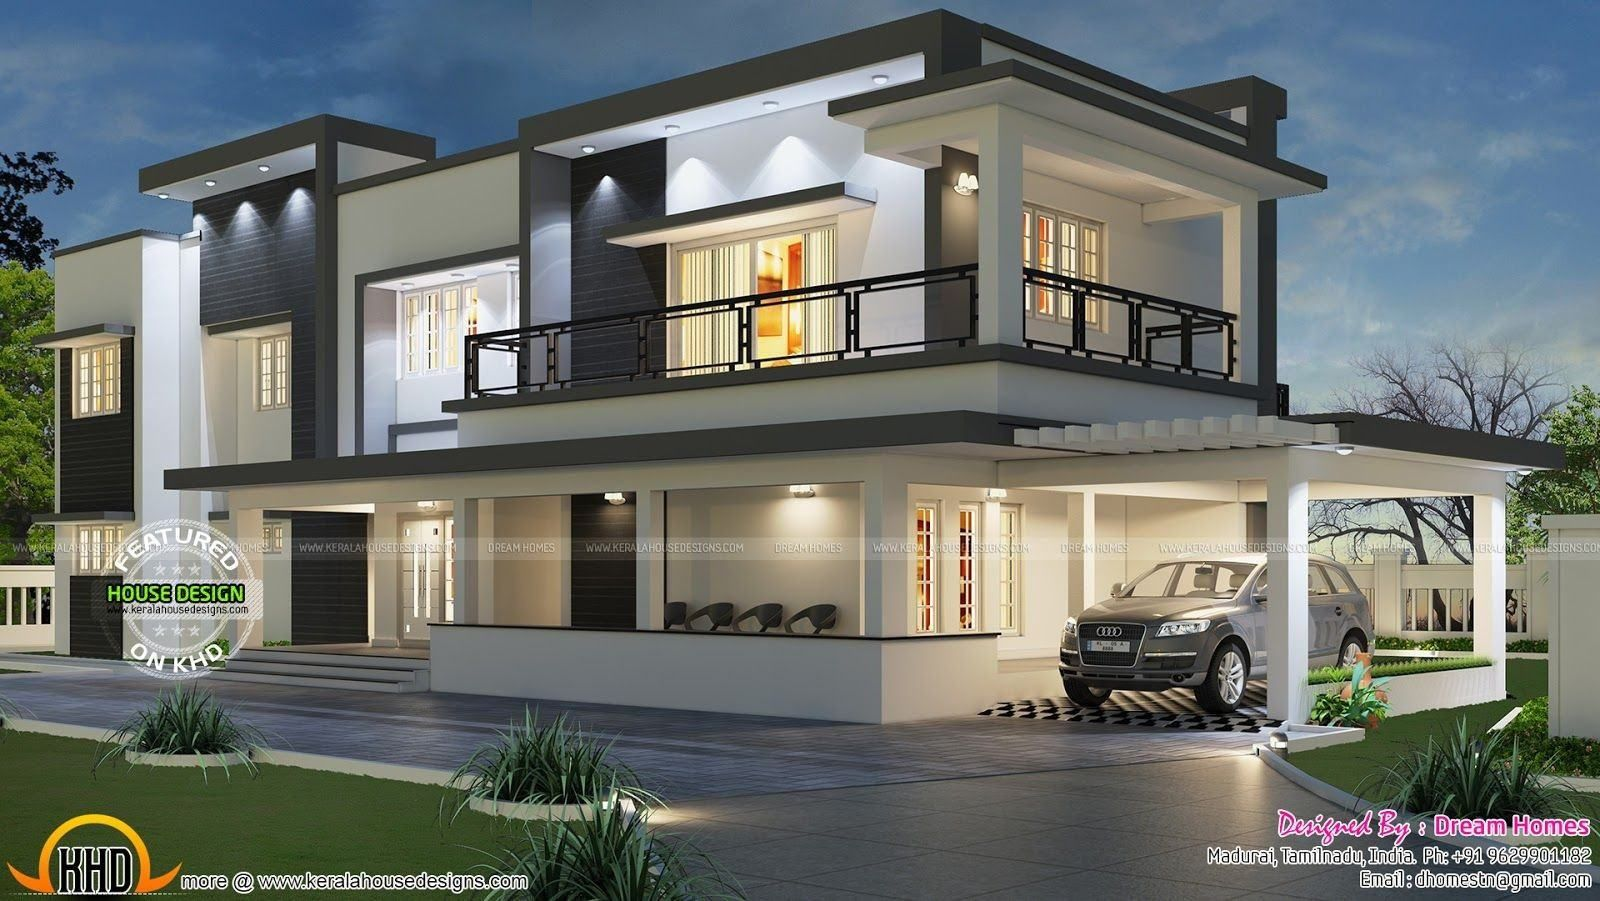 Stilt House Design Philippines In 2020 Flat Roof House Bungalow House Plans Modern Bungalow House